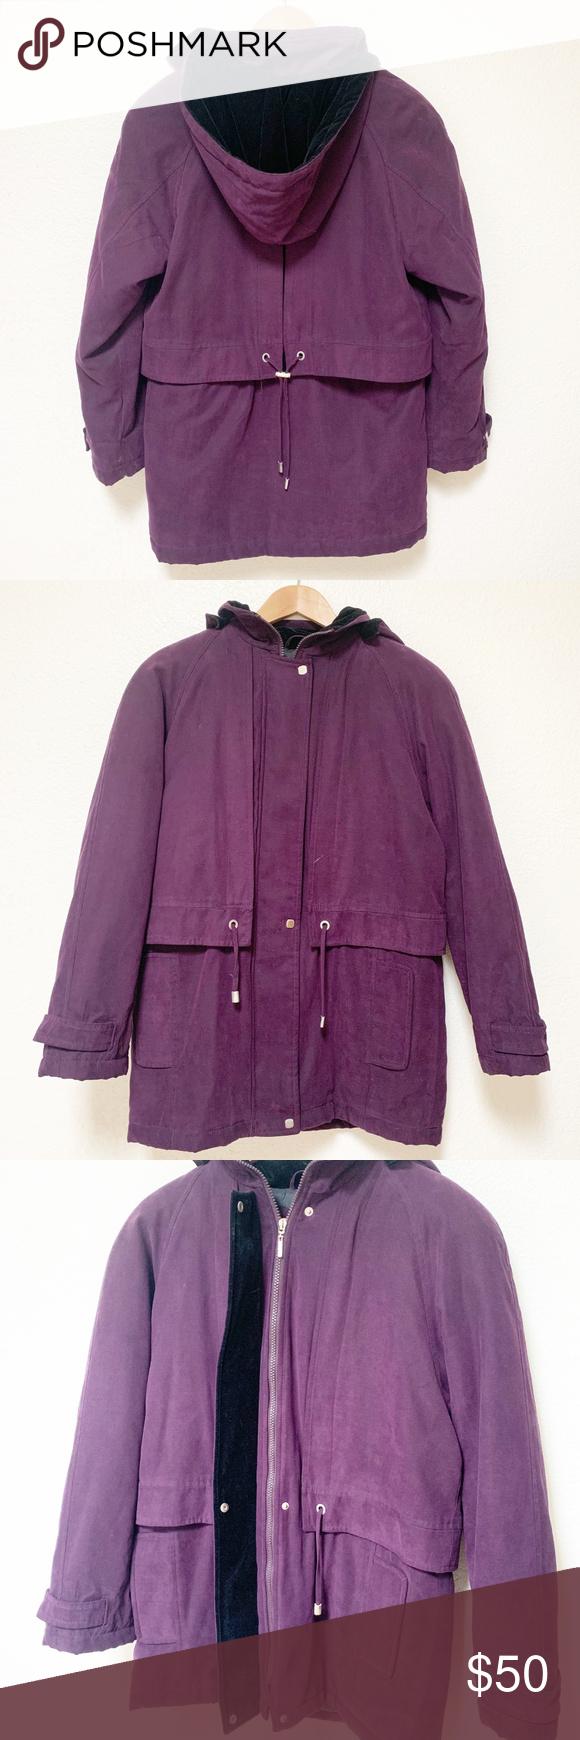 Izzi Outerwear Womens Purple Puffy Zip Up Jacket Jackets Zip Ups Outerwear [ 1740 x 580 Pixel ]